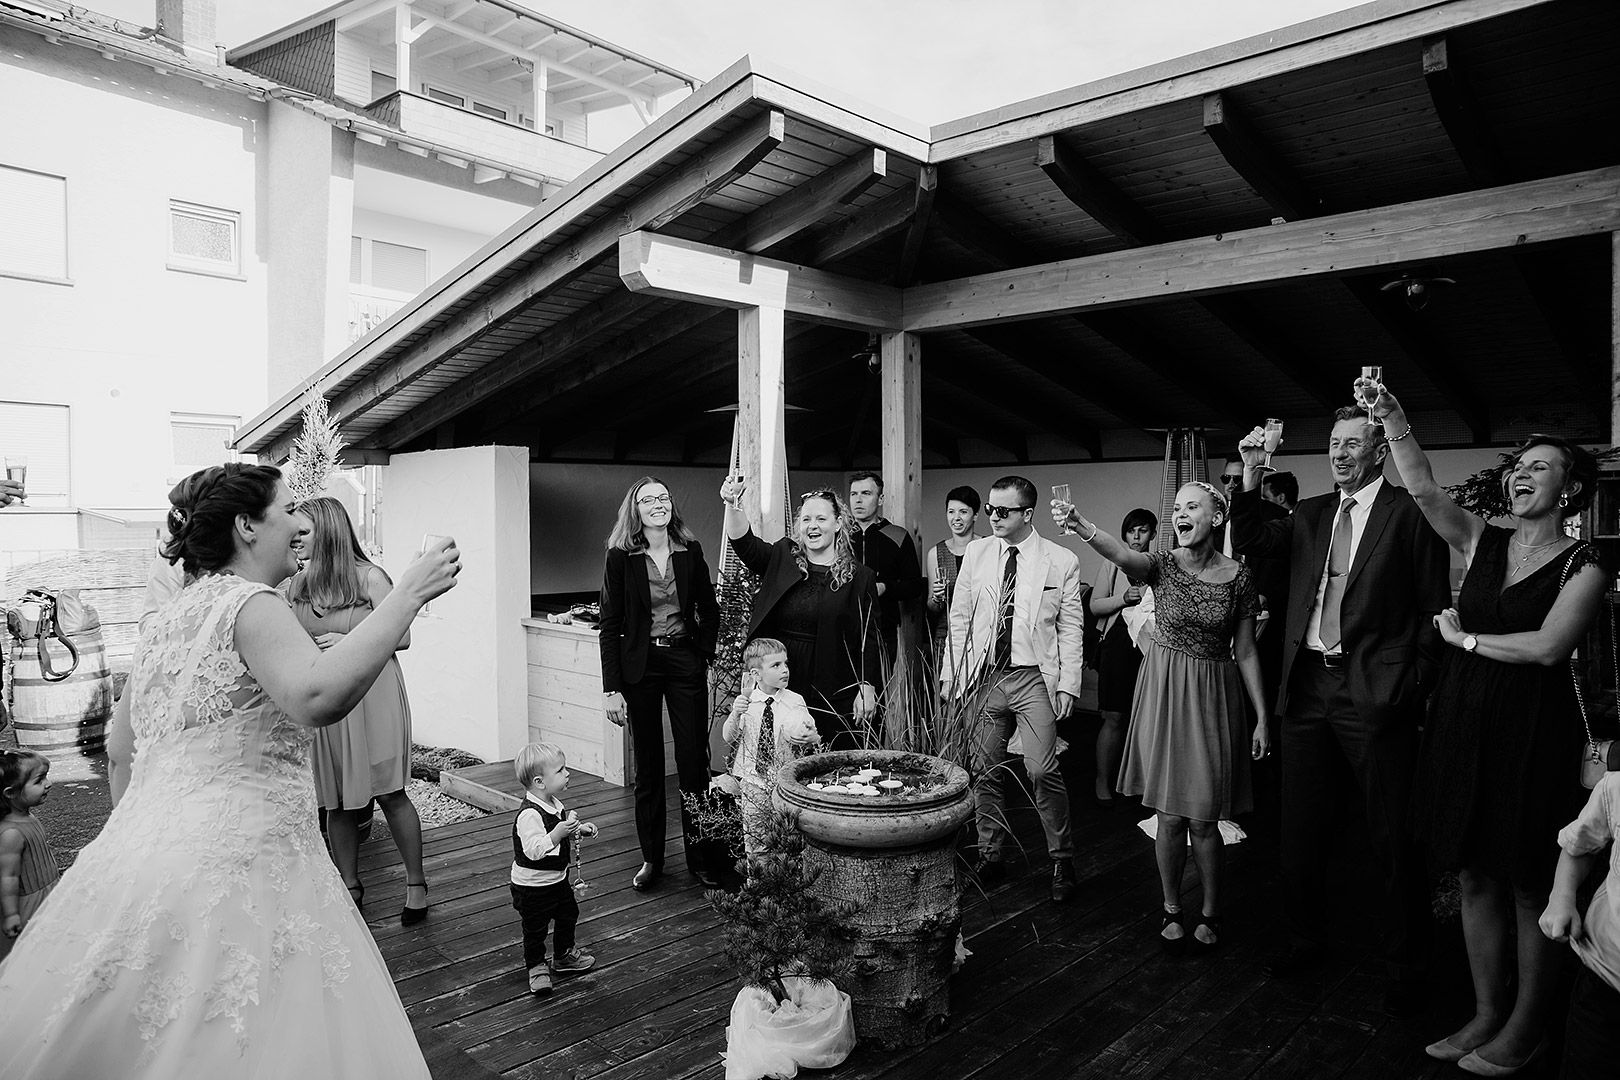 portrait_wedding_sabrinaundenrico_19